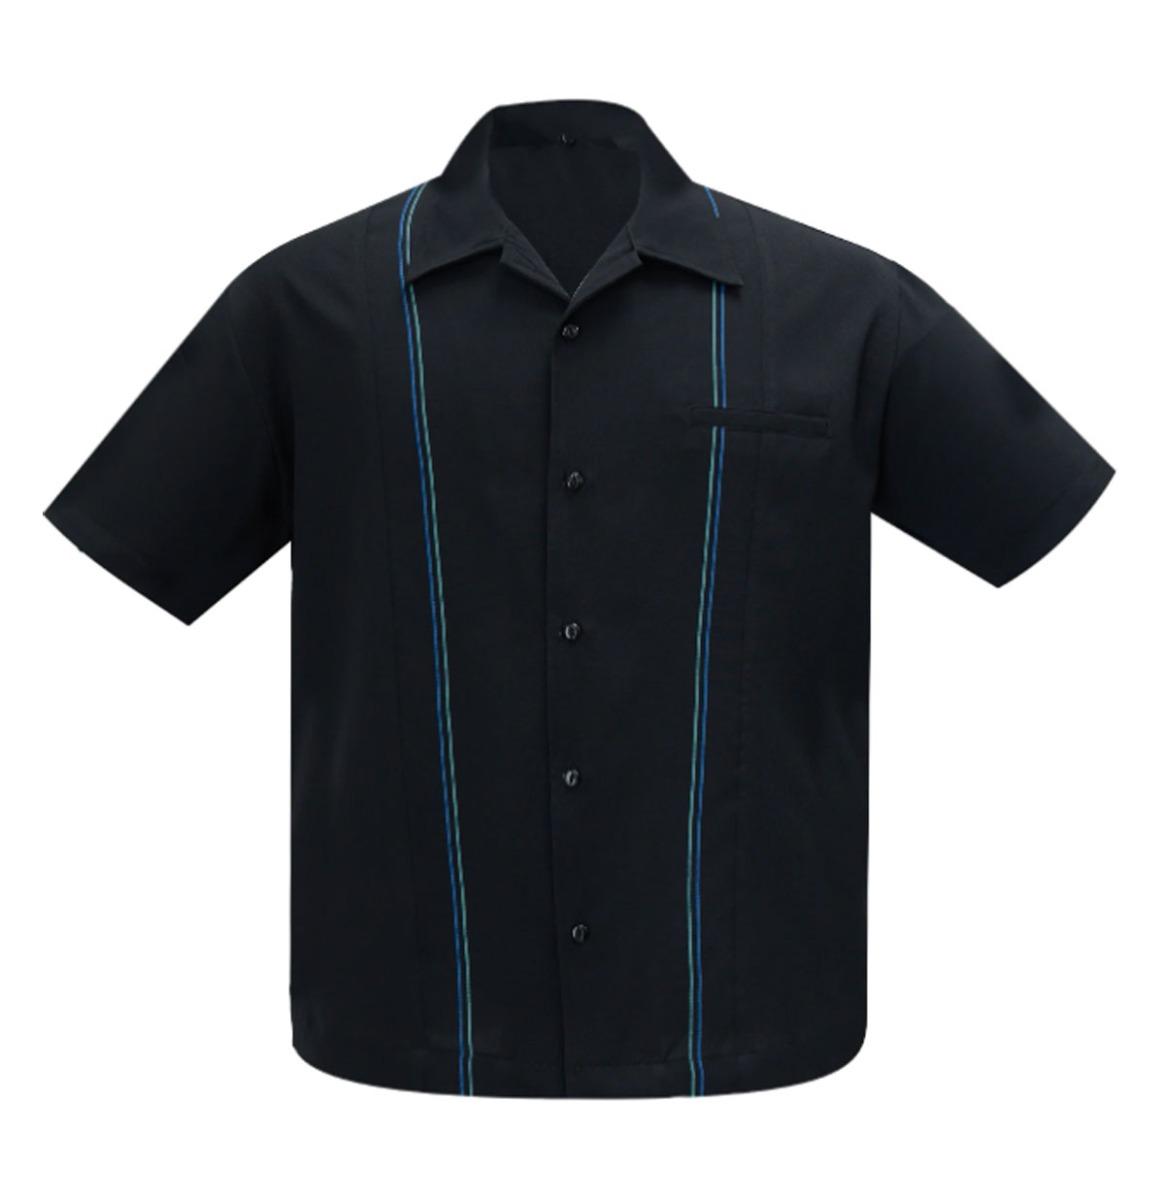 Steady Clothing The Harold Shirt Black